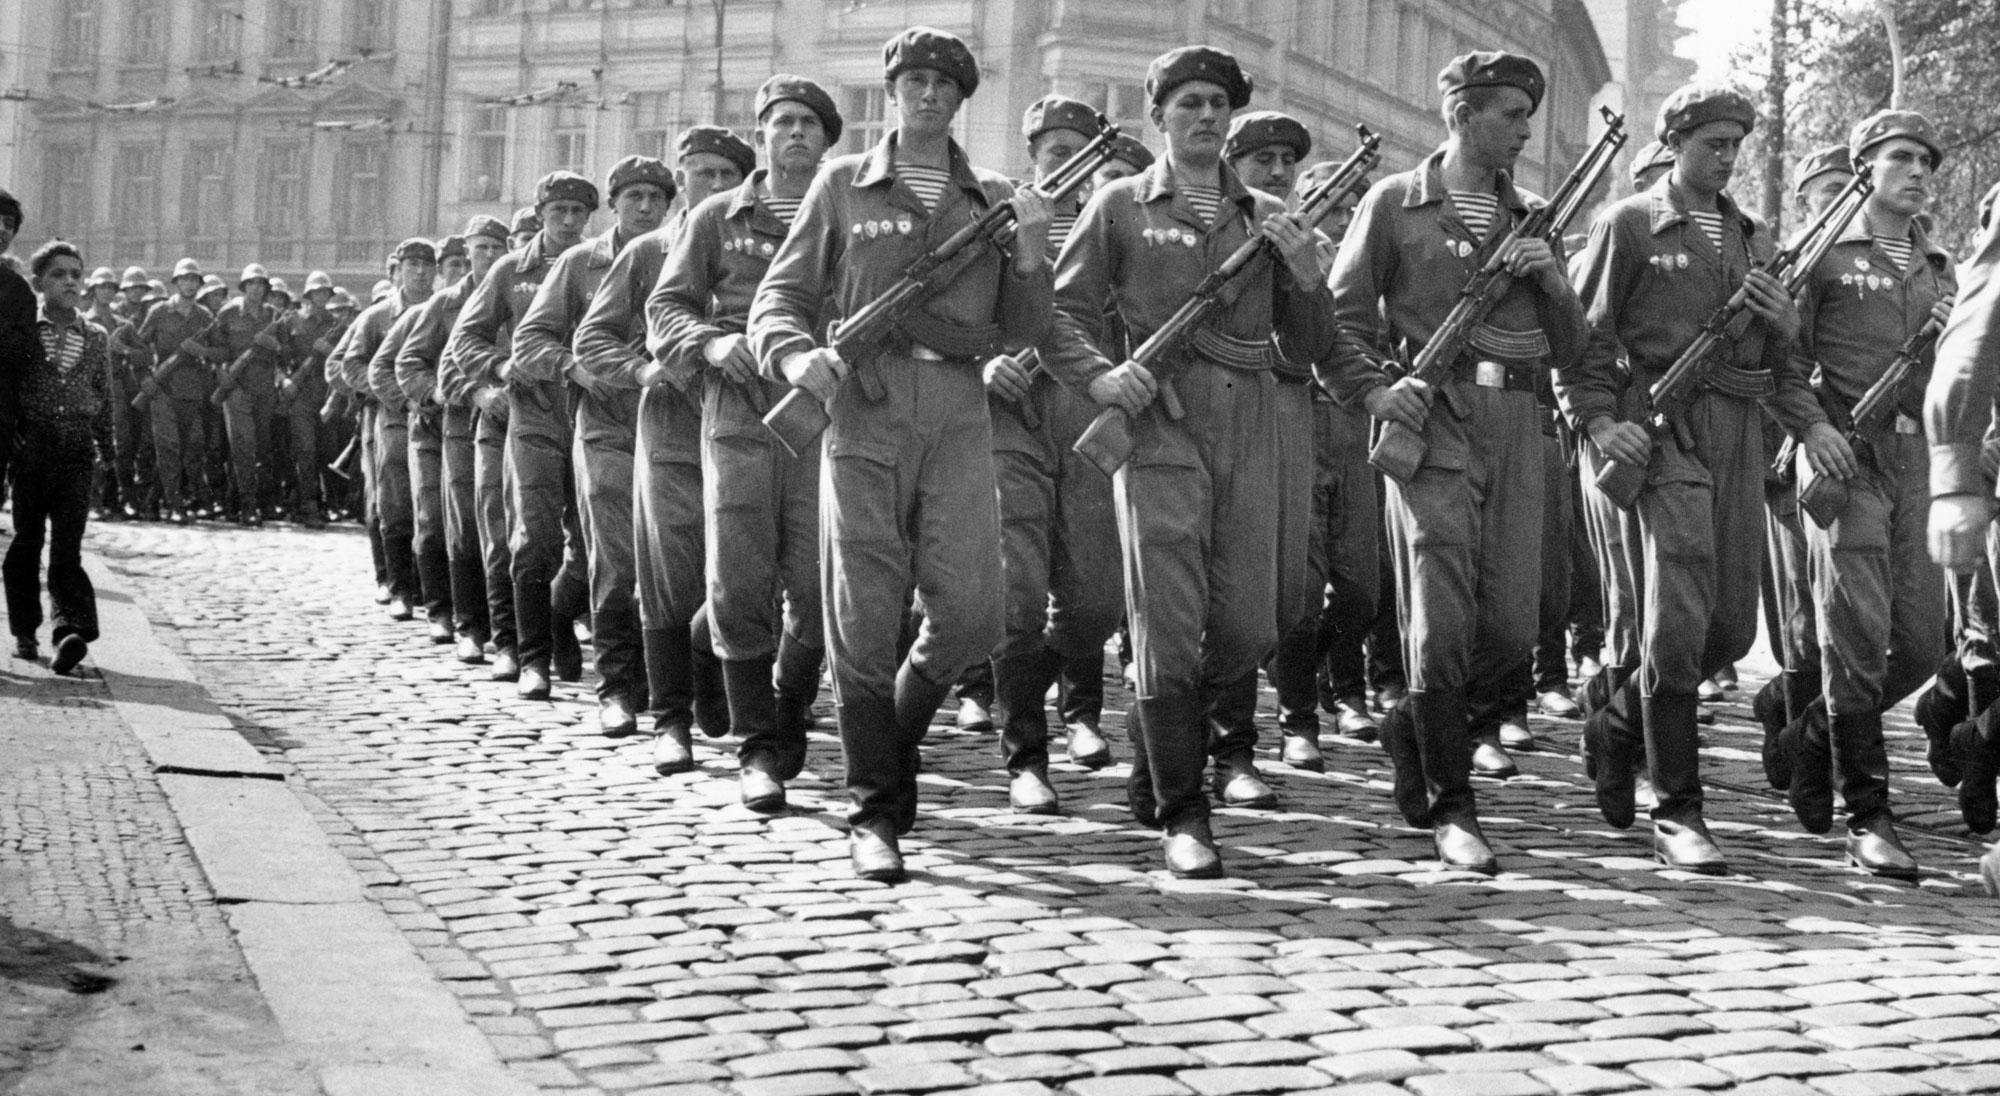 Ejercito comunista en Praga